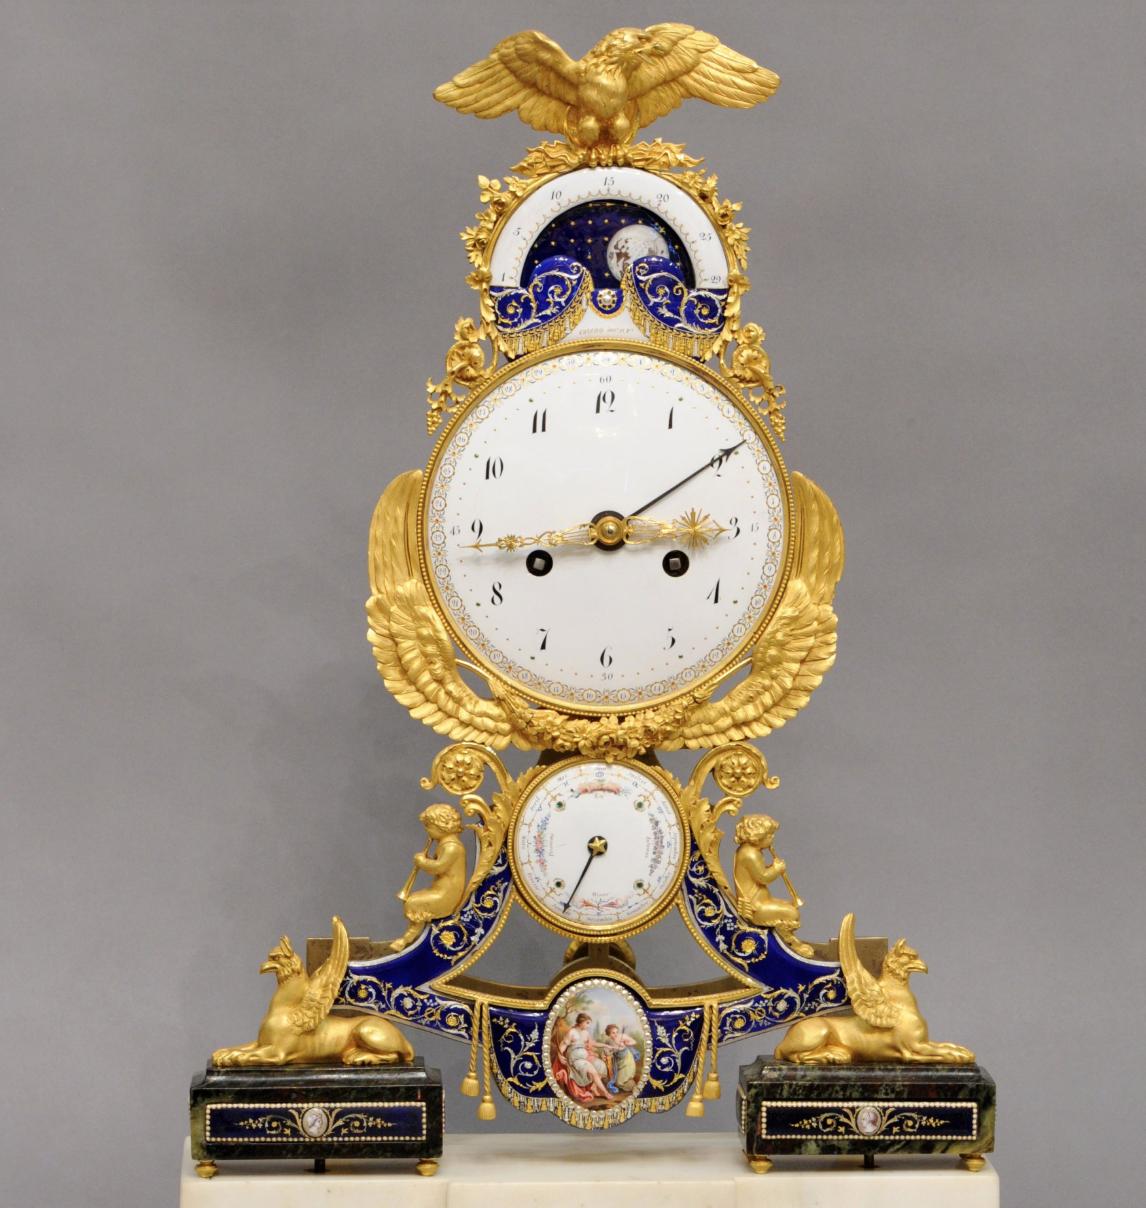 A beautiful  oseph Coteau, Mantel clock, 1796, France, enamelled bronze, gilt, marble.